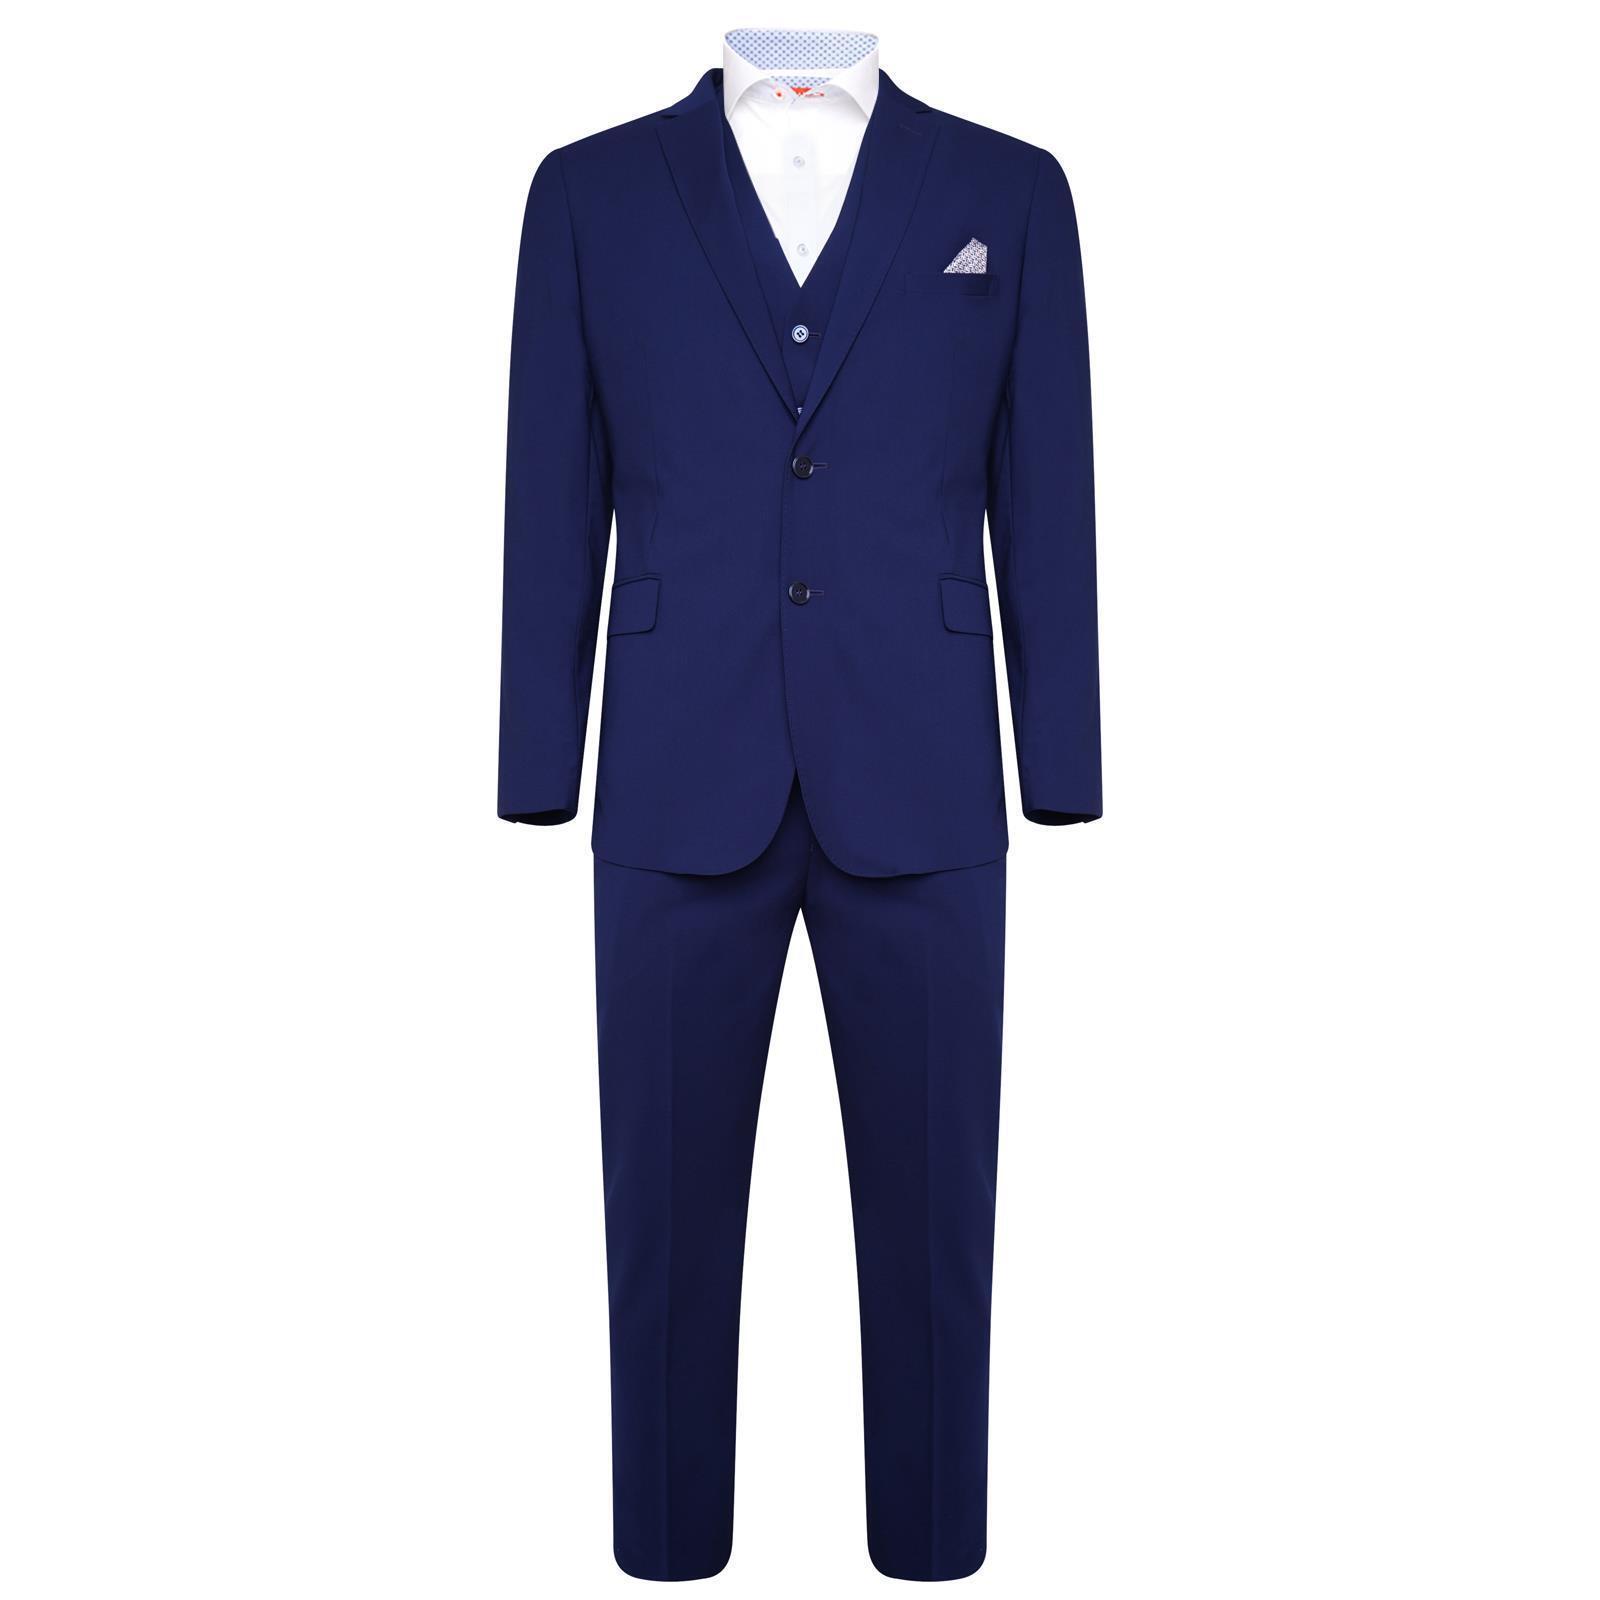 Harry Braun Bamboo 3 Piece Slim Fit Suit in Blau